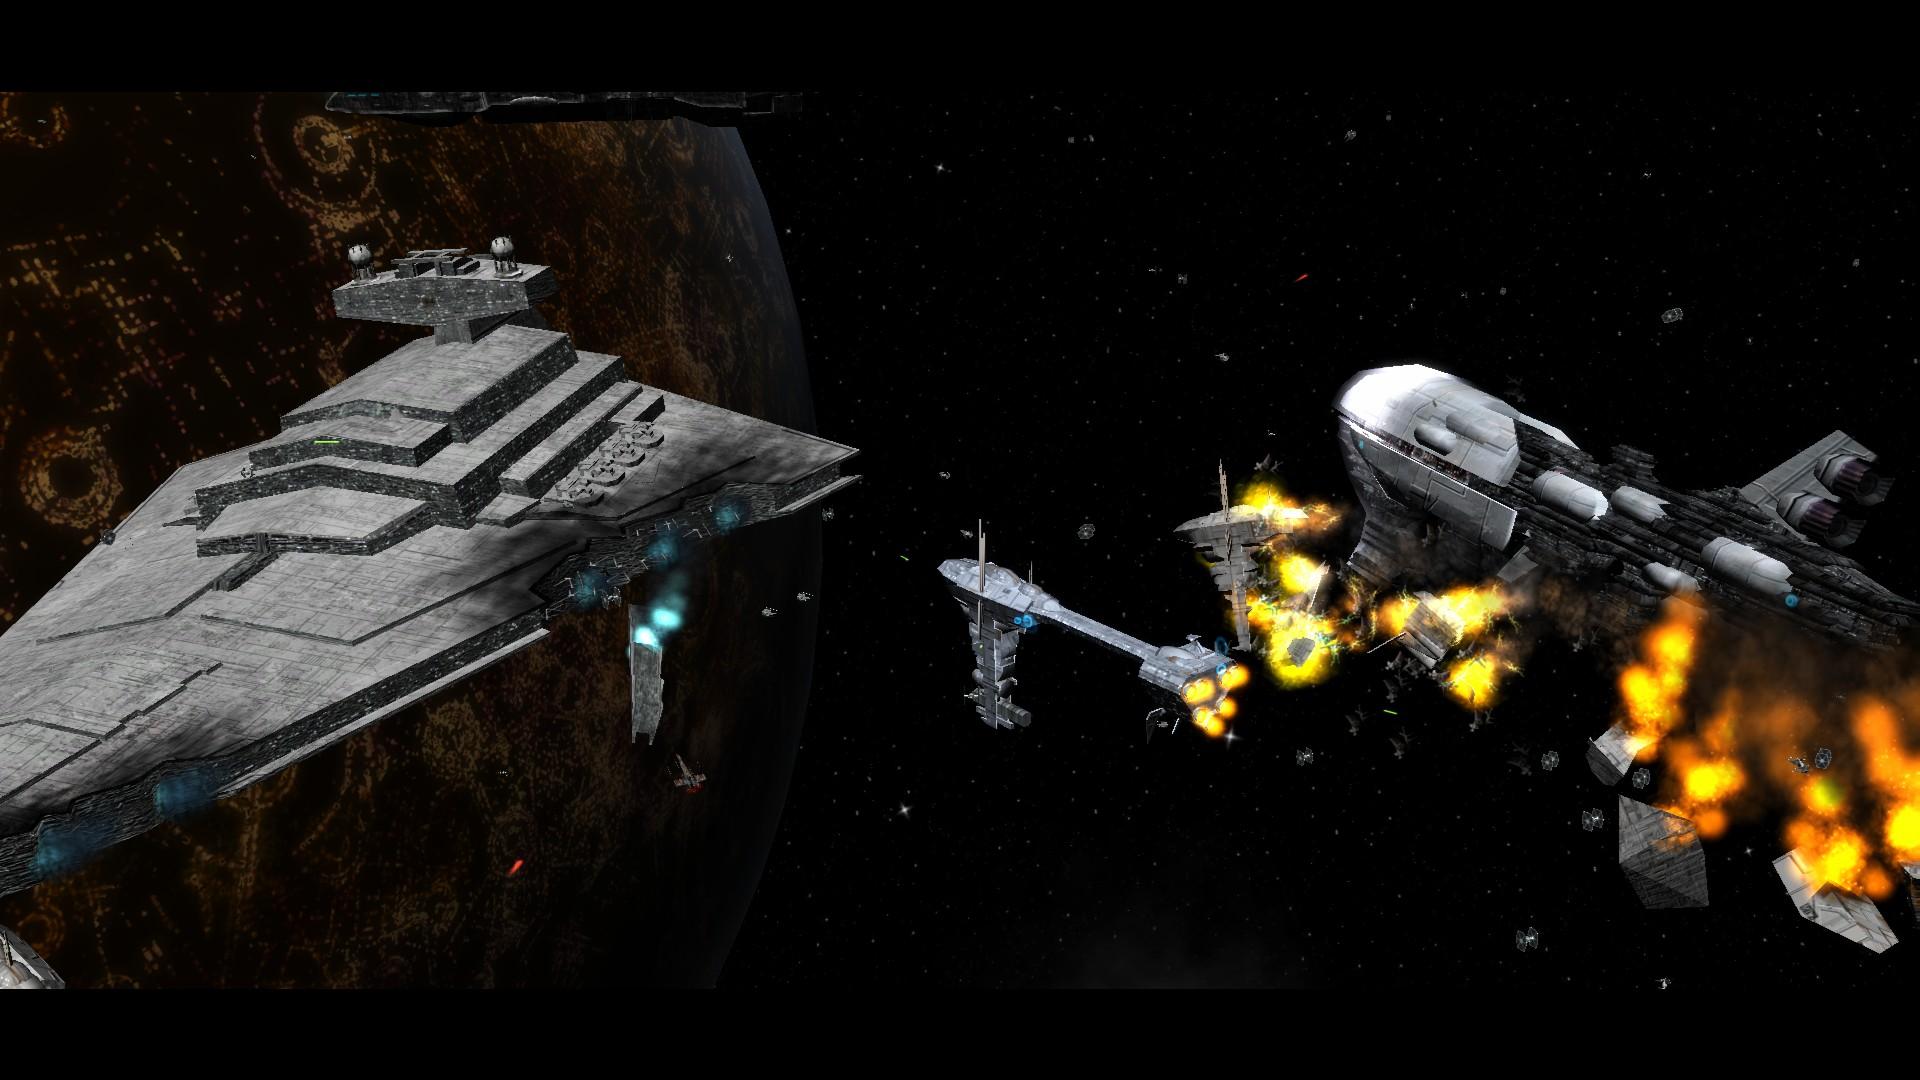 Star Wars Space Battle Hd Wallpaper  war full modimagesspace 1920x1080